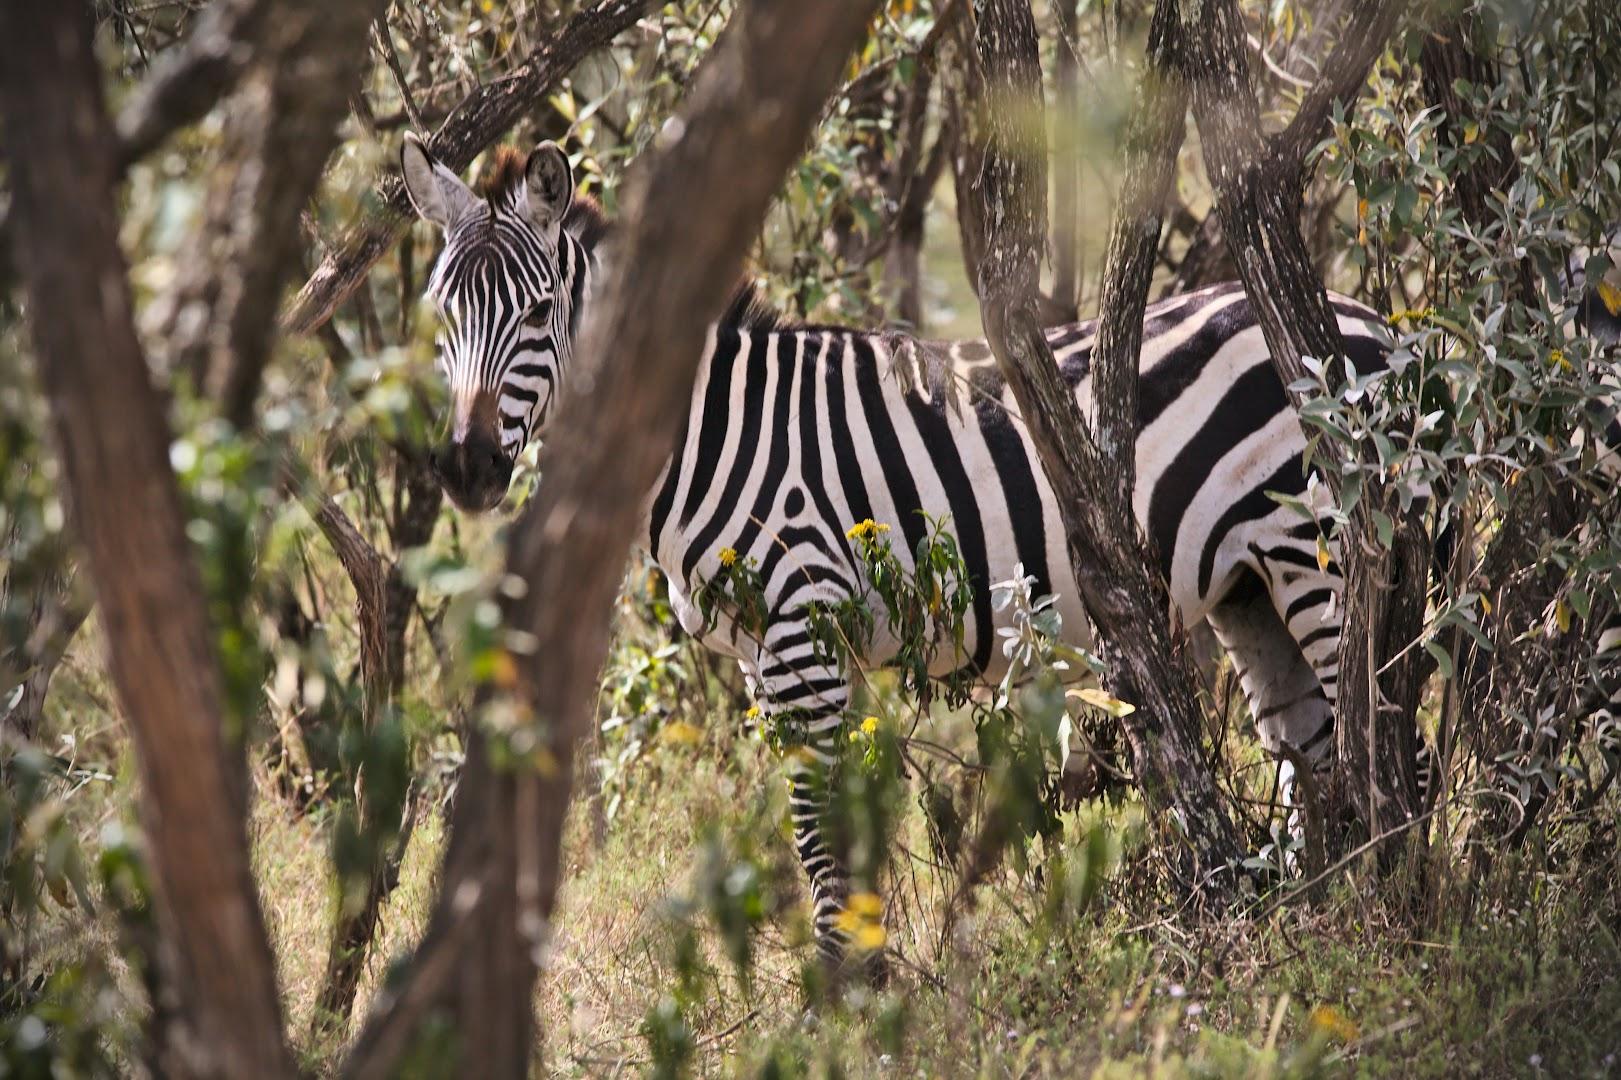 Hunting for zebras